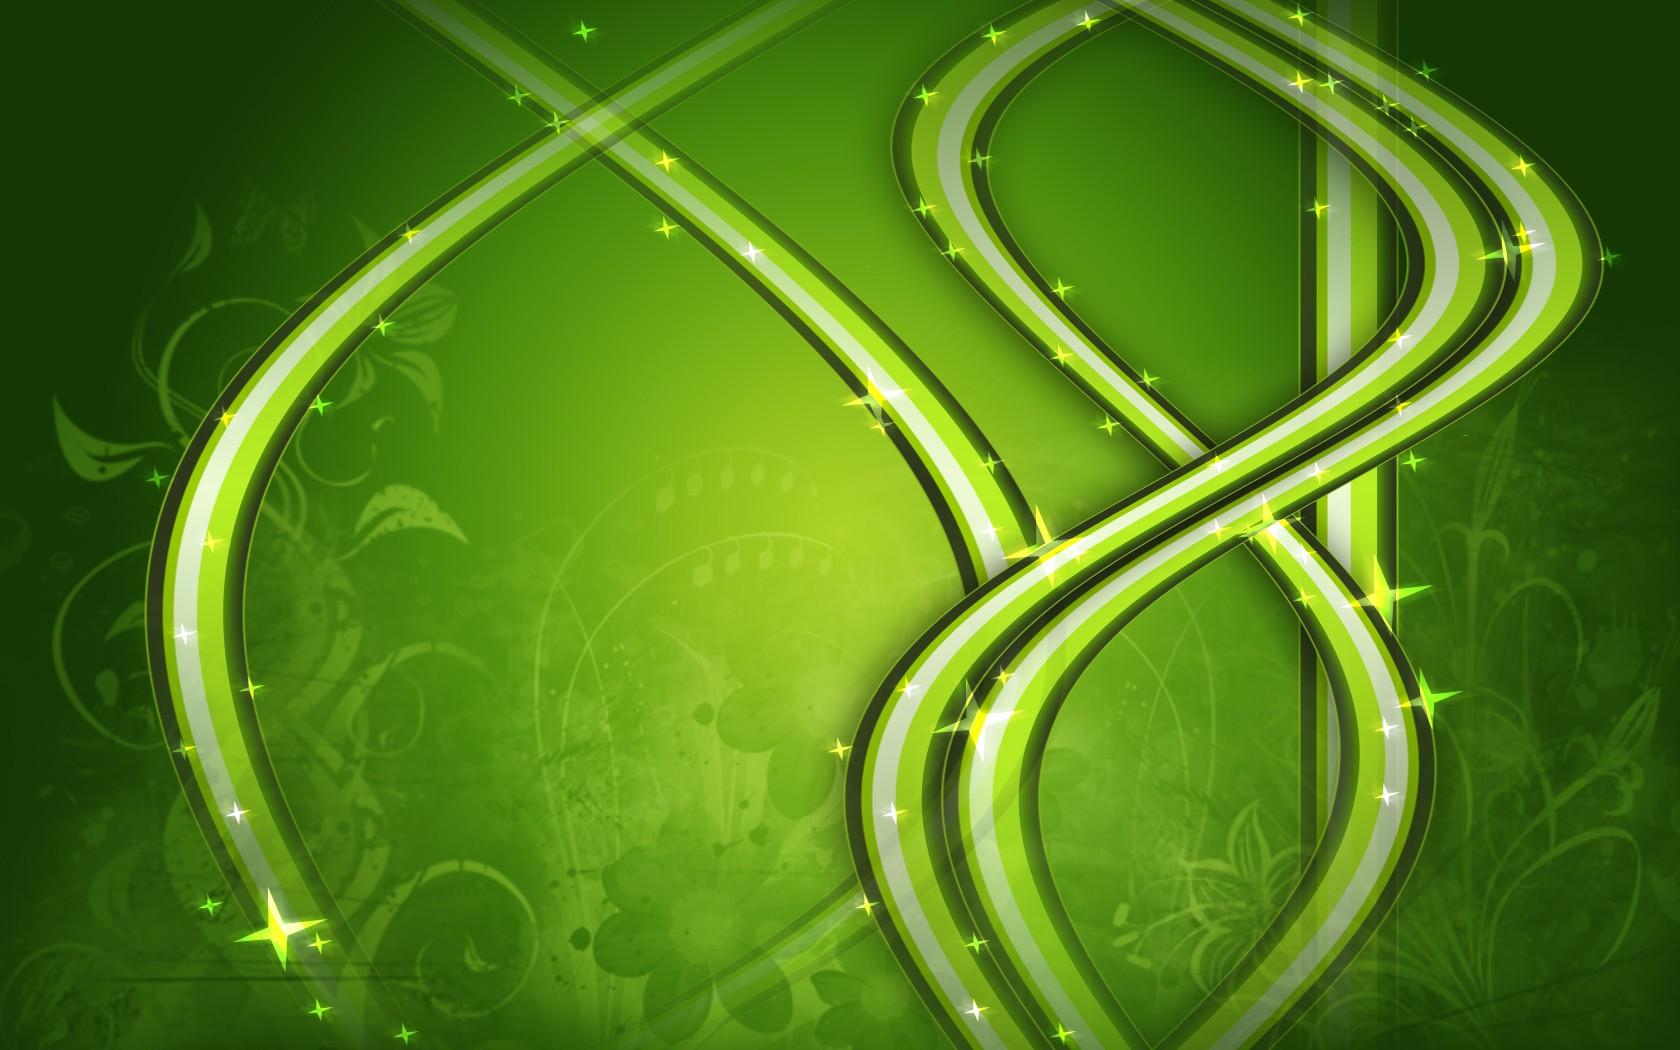 Adornos verdes - 1680x1050